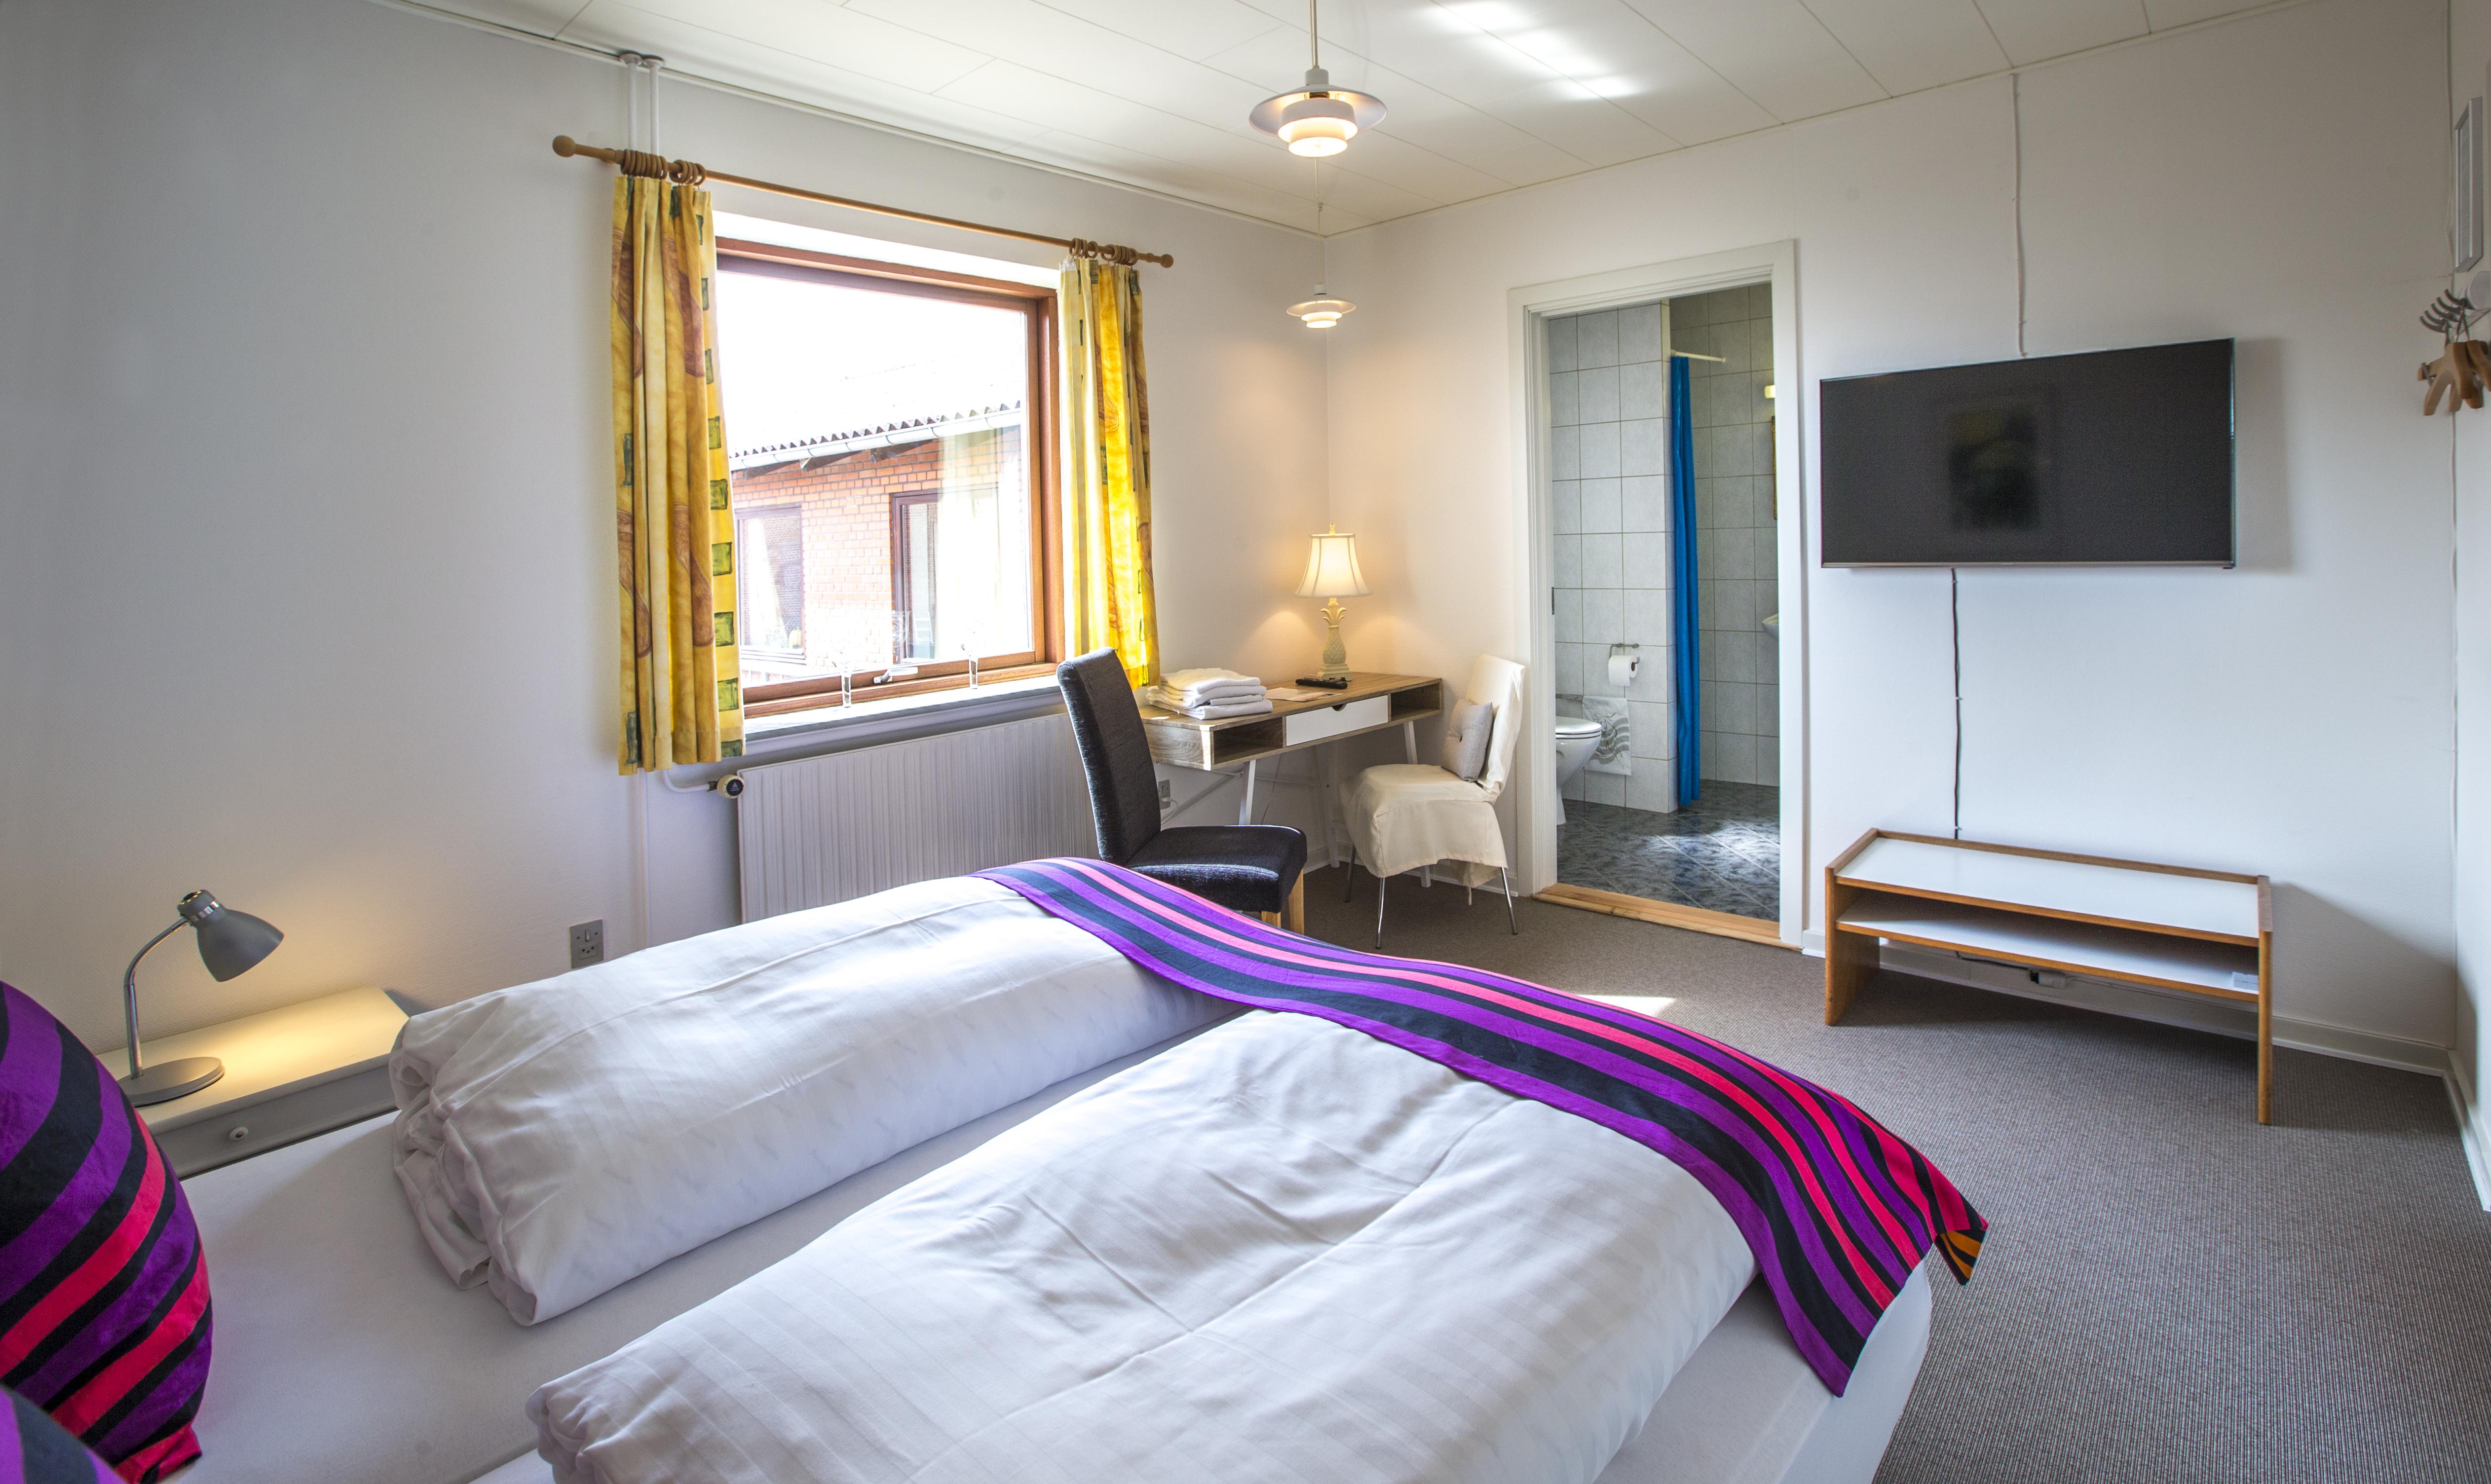 Hotel Bording | Overnatning